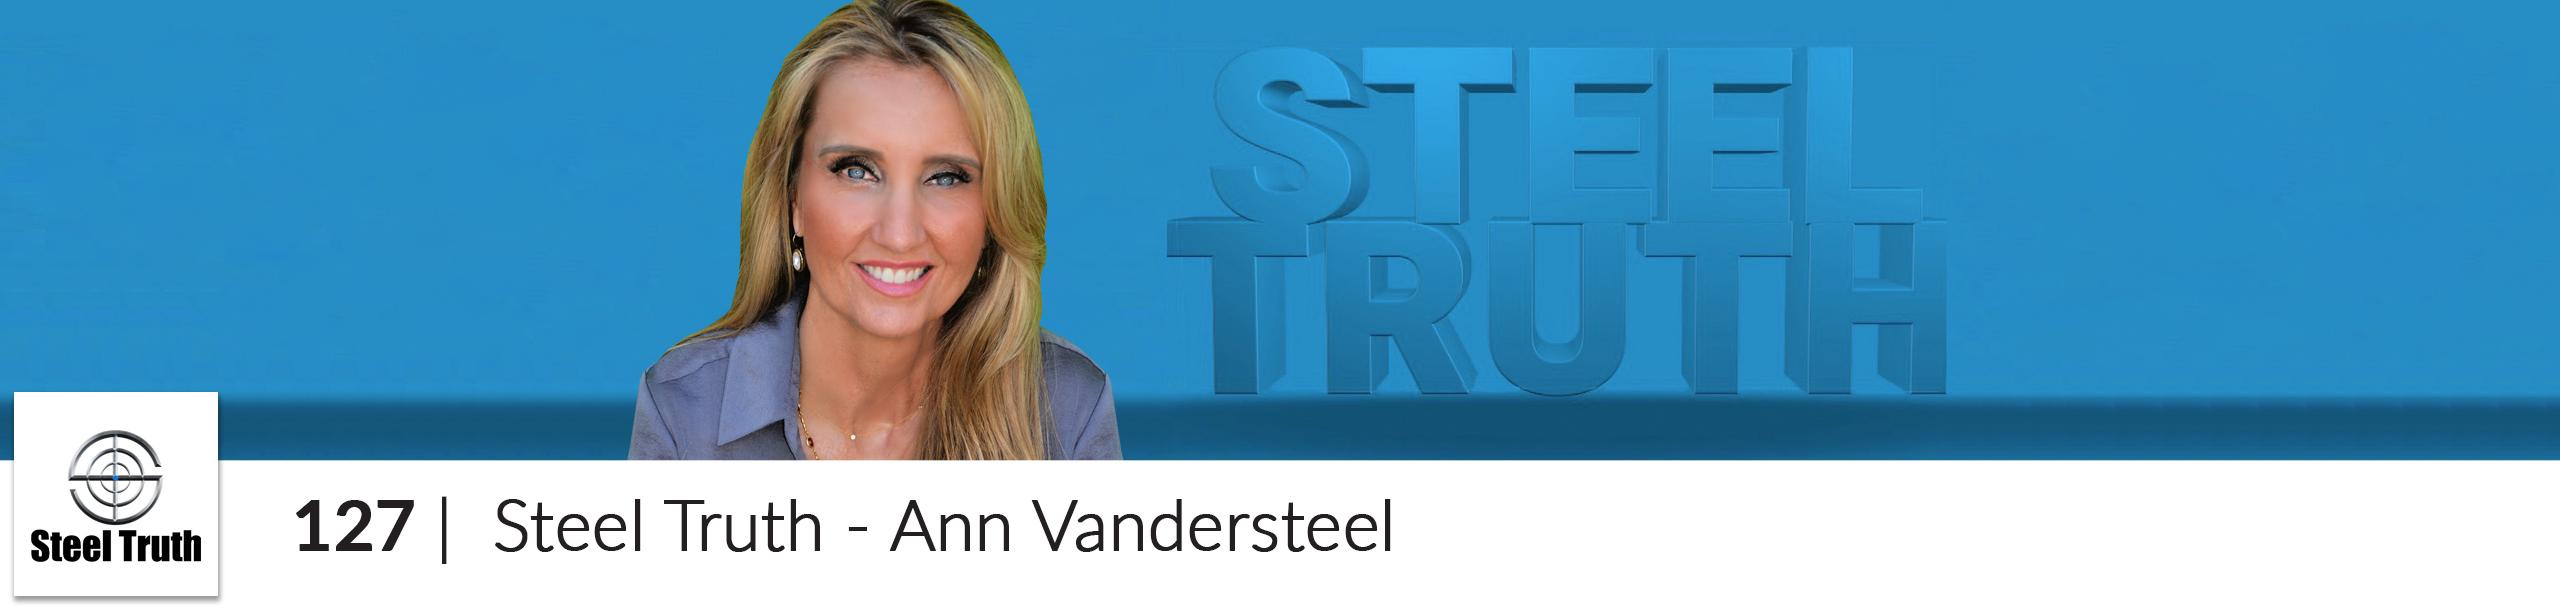 SteelTruth-header01-1